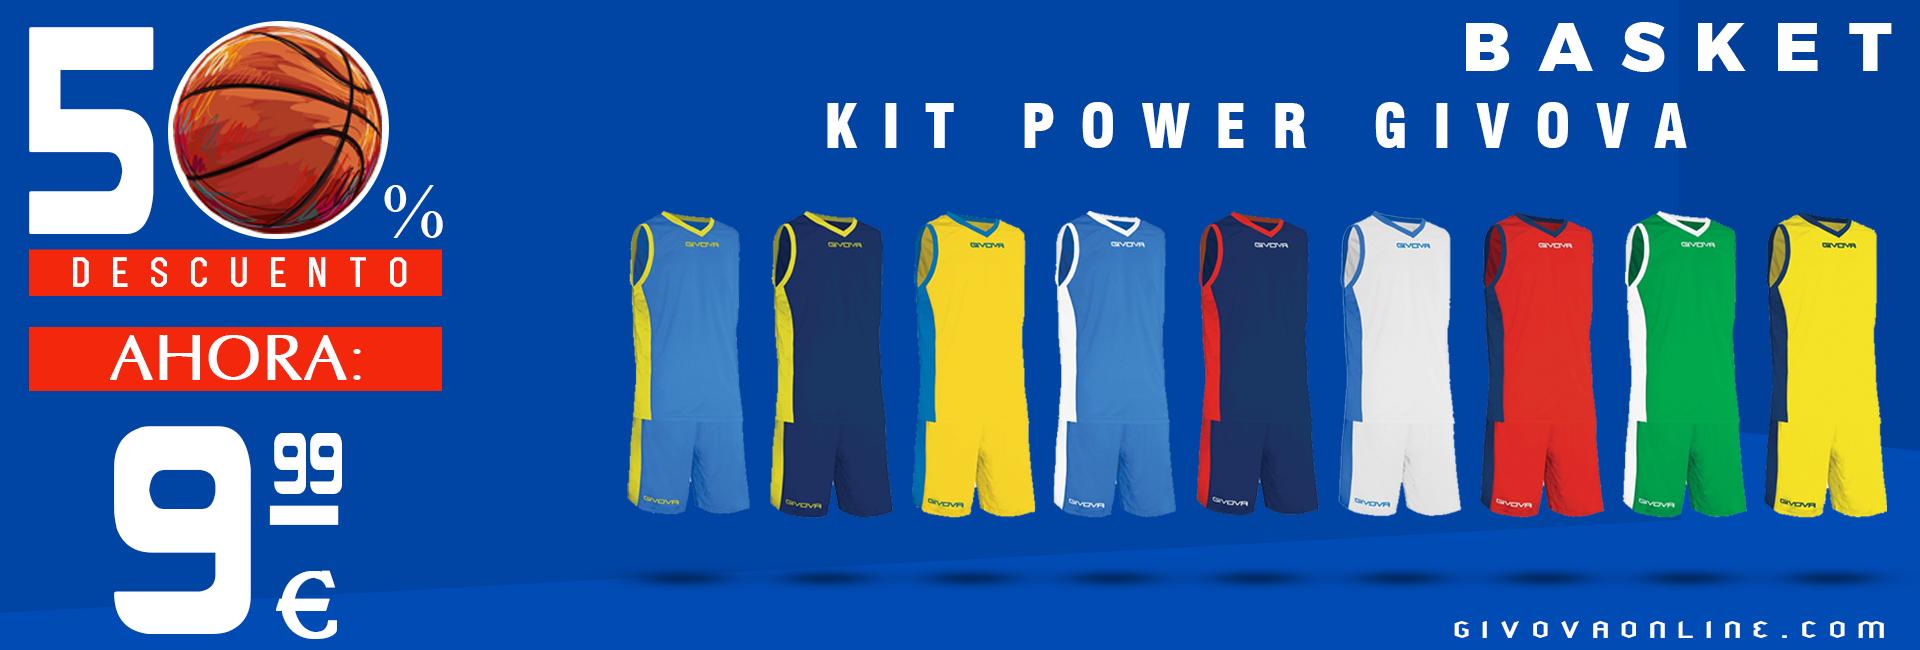 Kit Power Givova